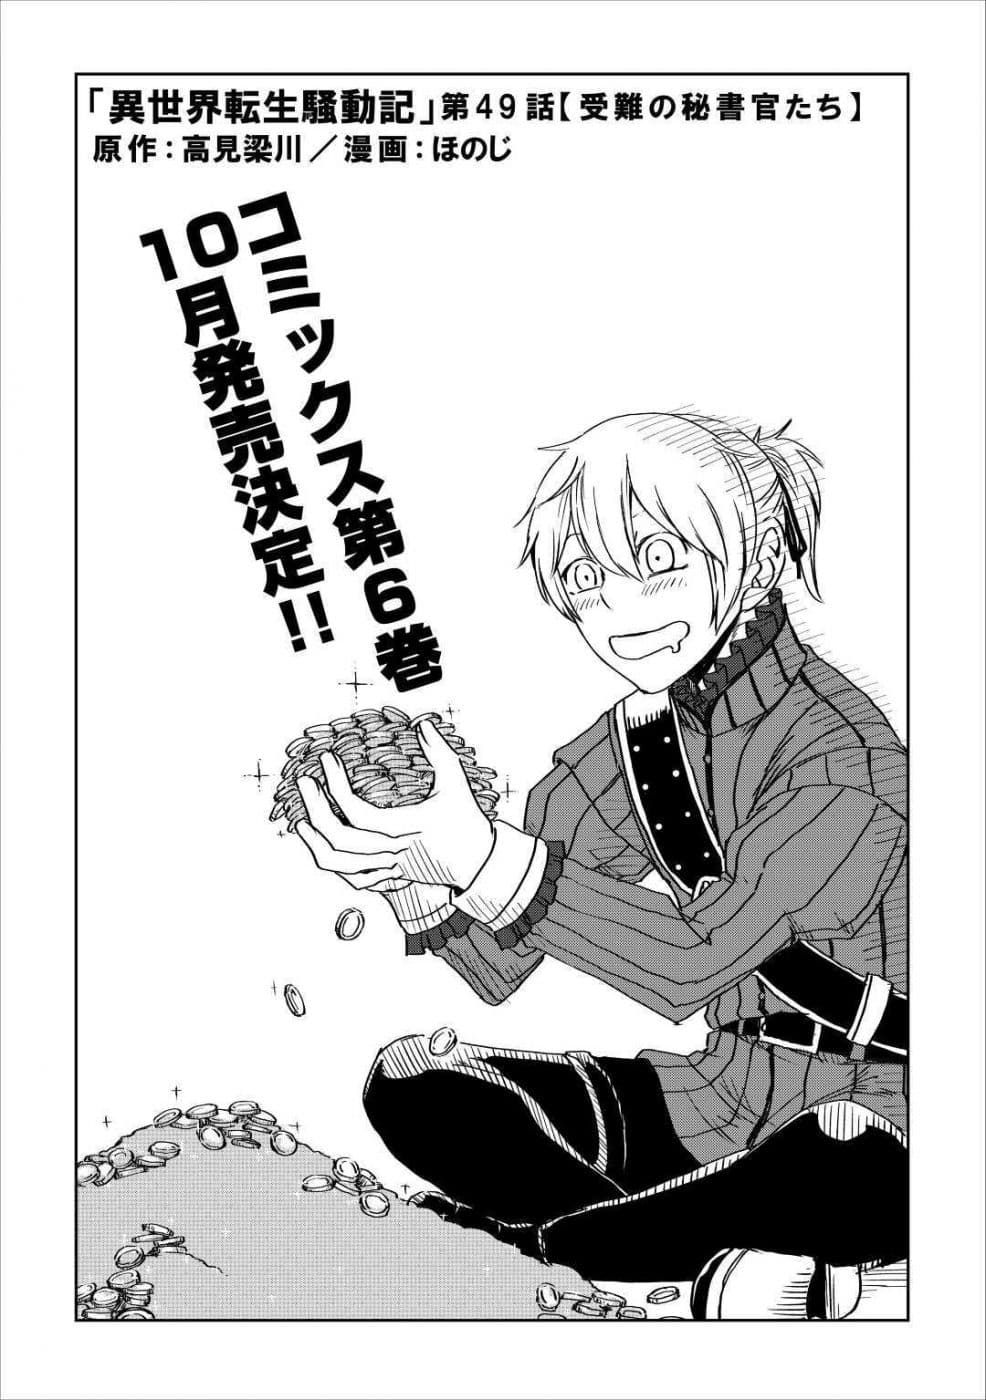 lnwmanga อัพเดท 10/10/2019 ]]] อ่านการ์ตูน Isekai Tensei